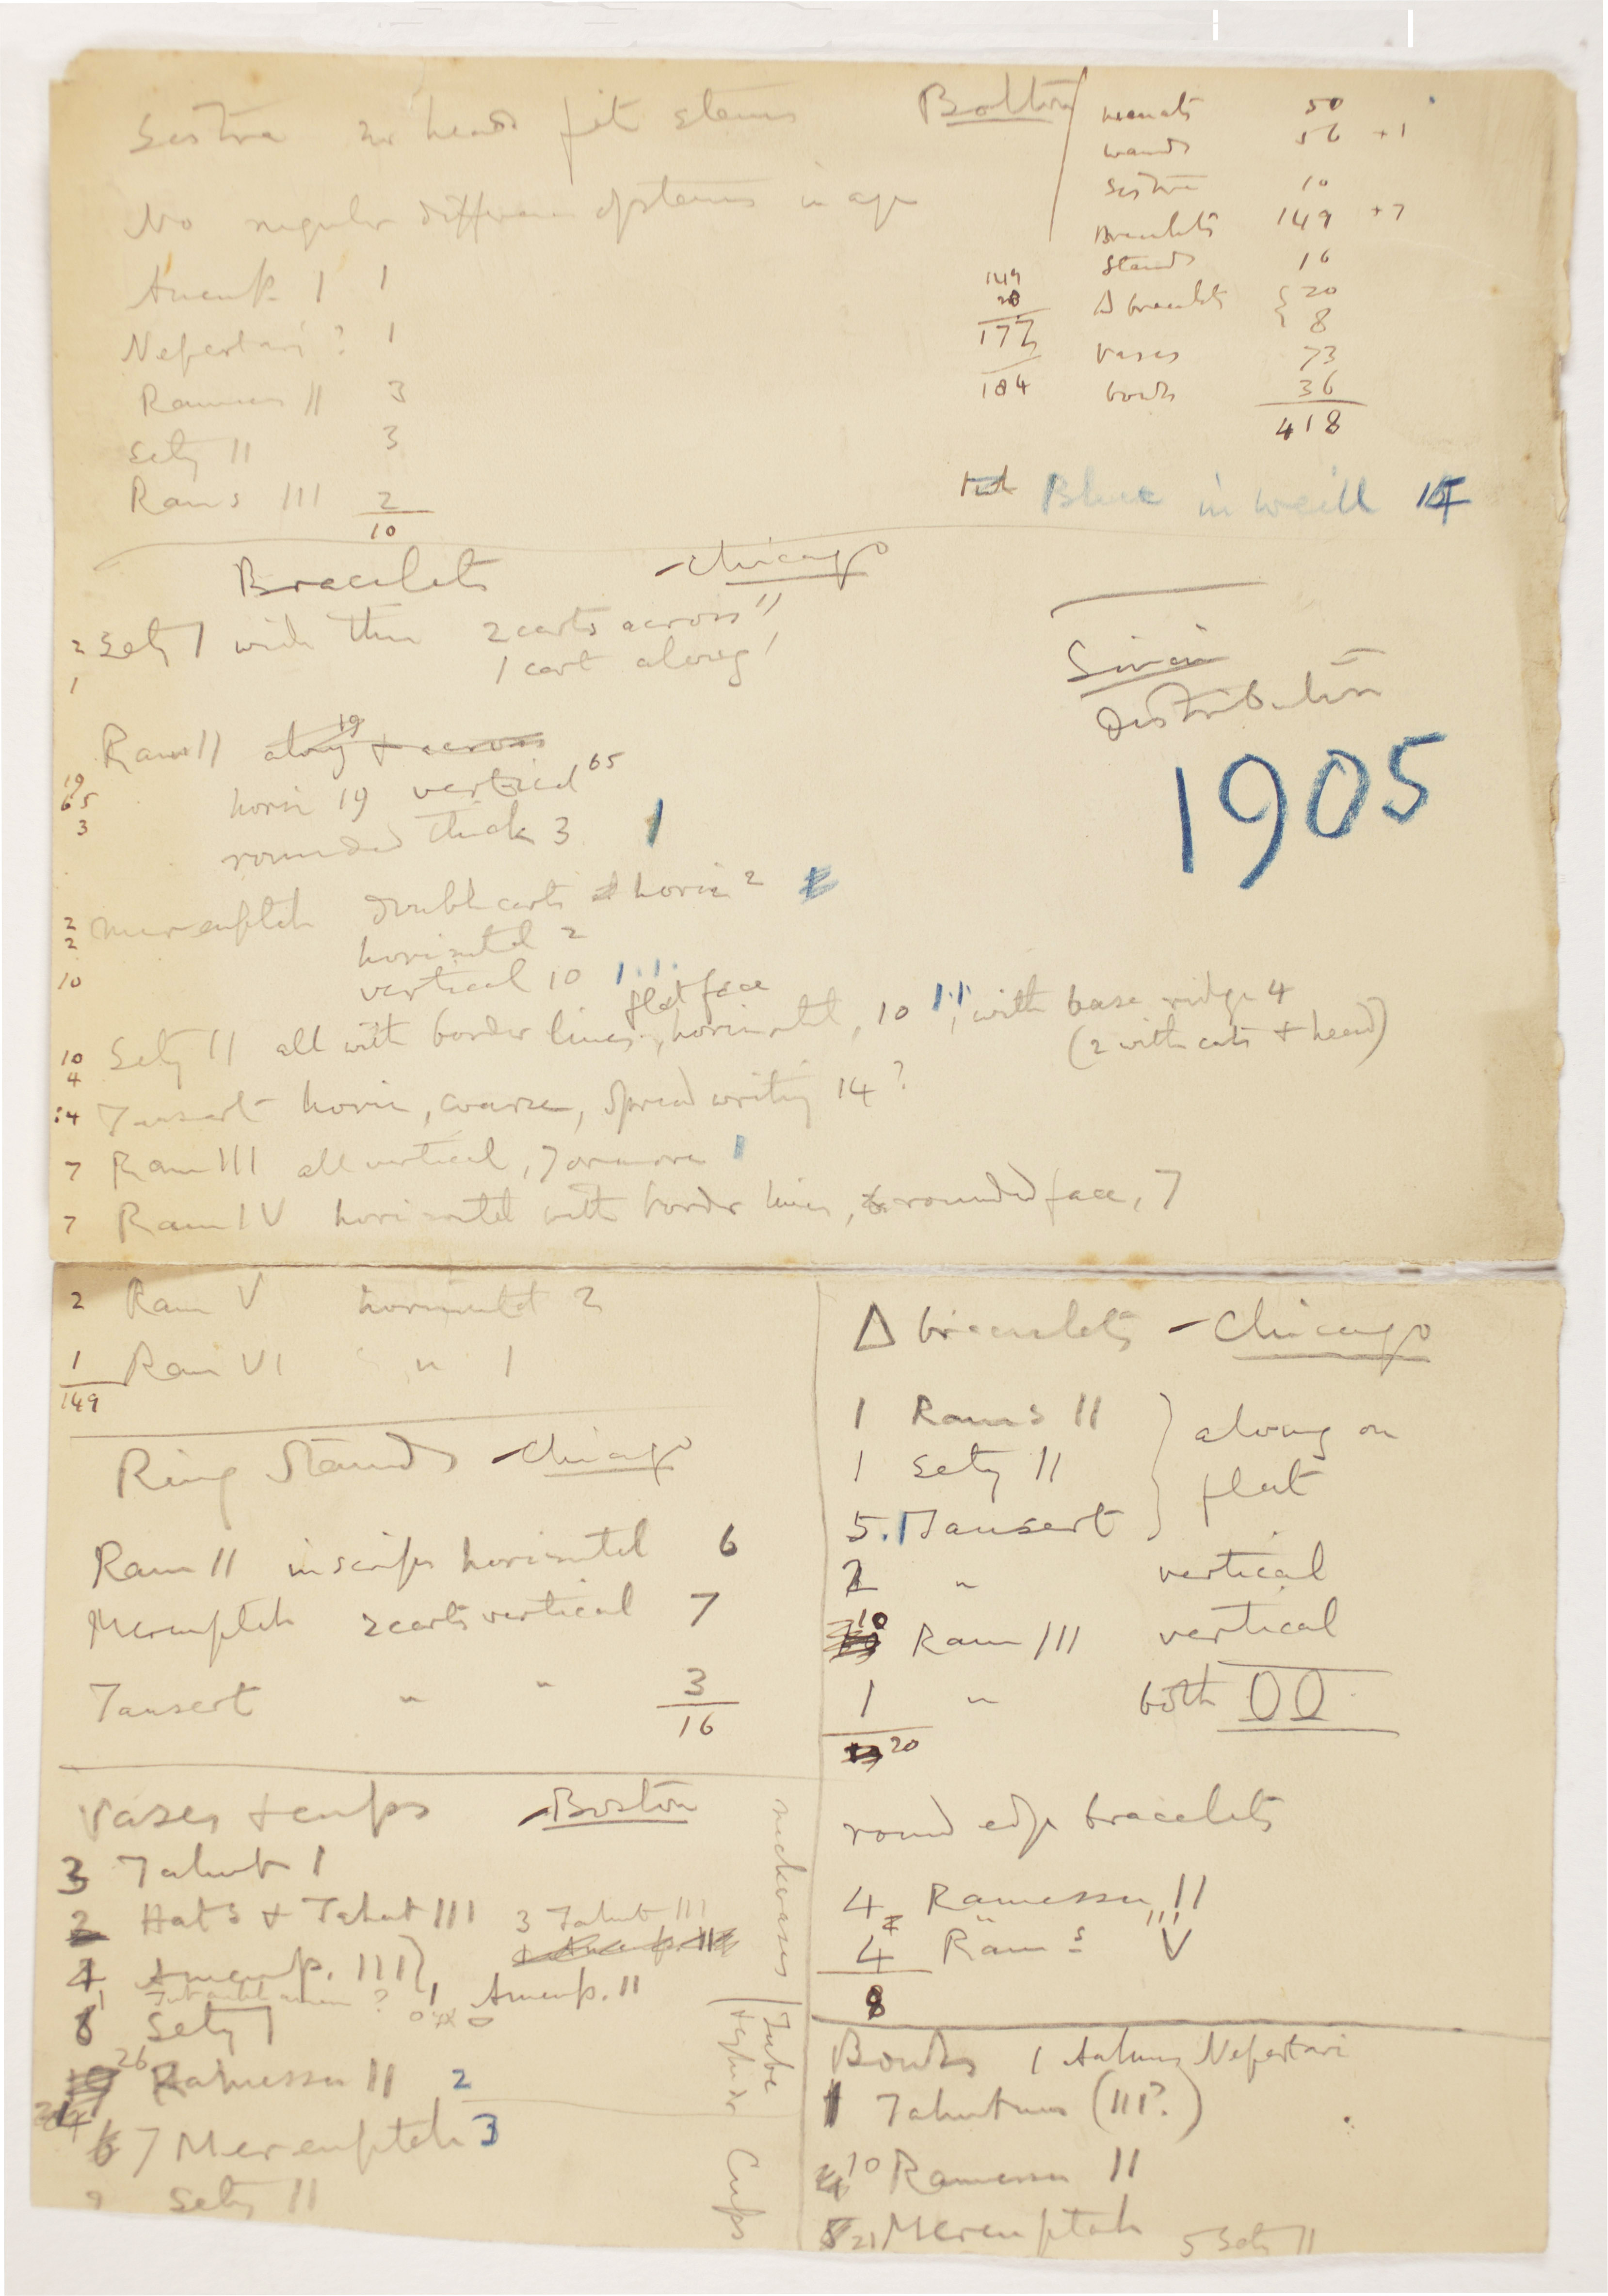 1904-05 Saqqara, Serabit el-Khadim, Sinai, Magharah, Sinai Multiple institution list PMA/WFP1/D/13/1.1